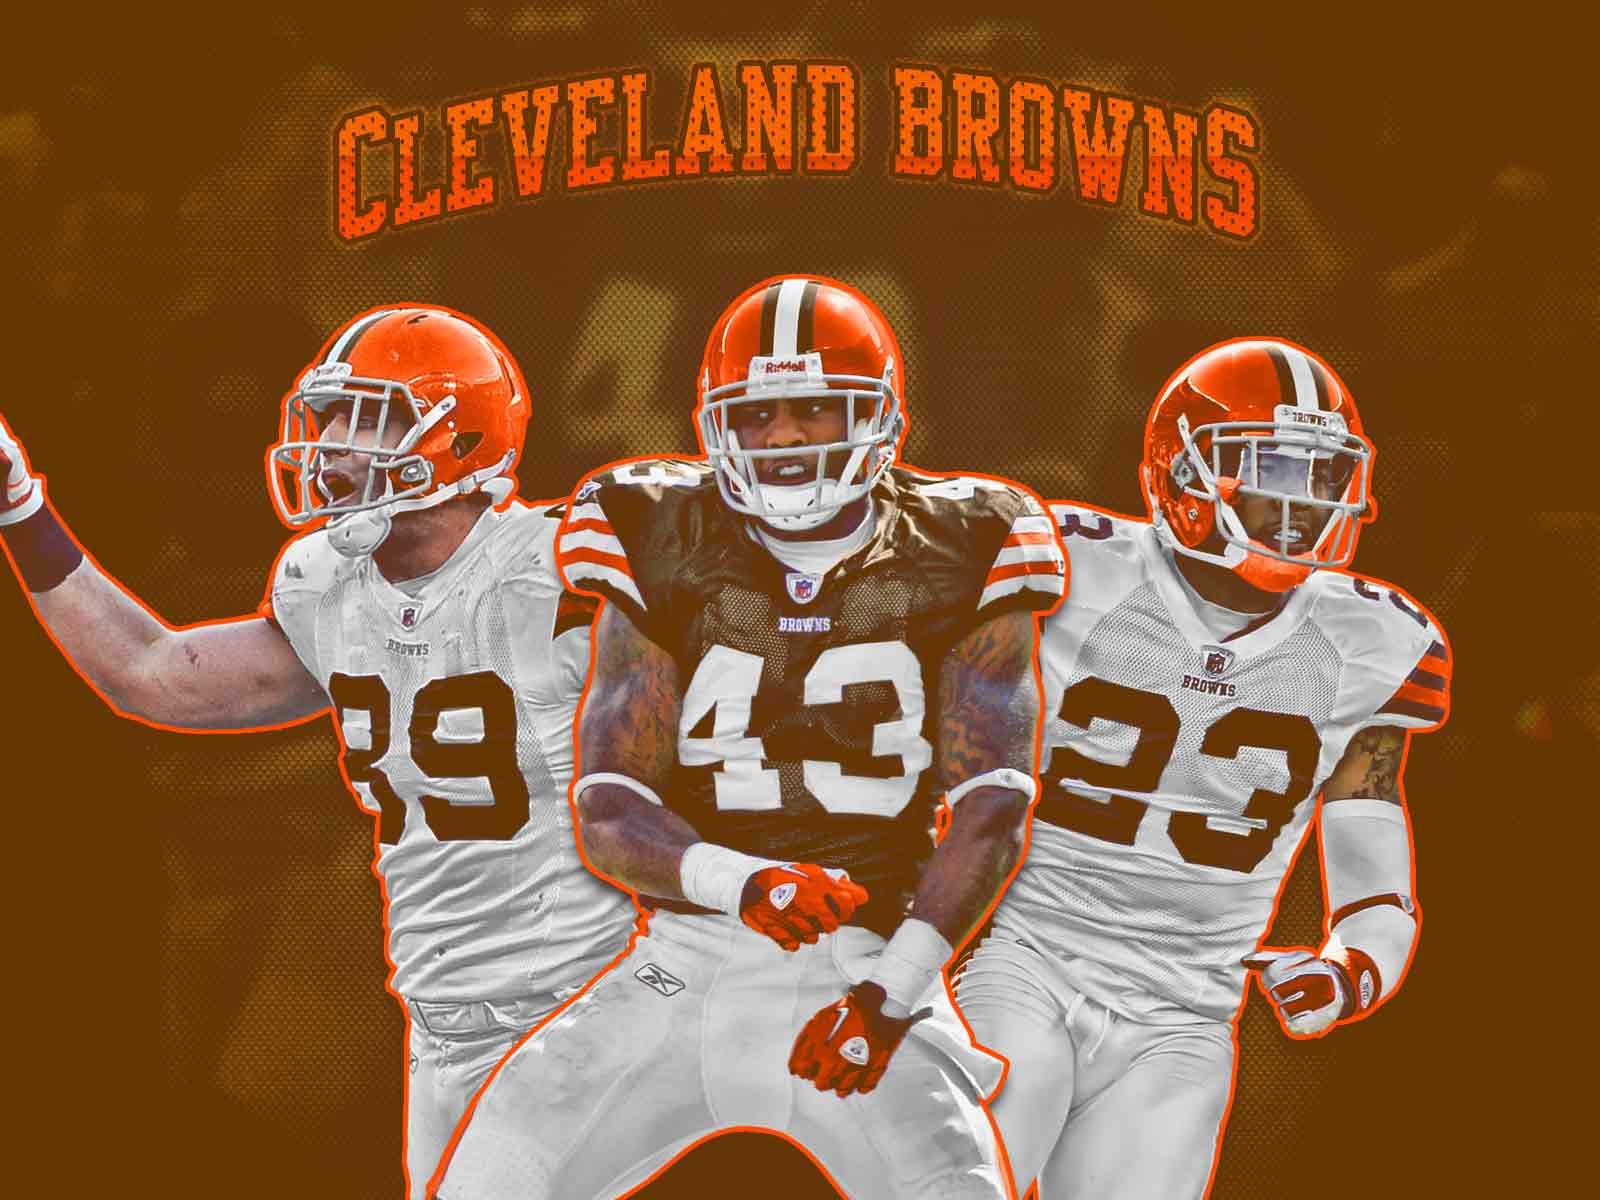 [44+] Cleveland Browns HD Wallpaper on WallpaperSafari